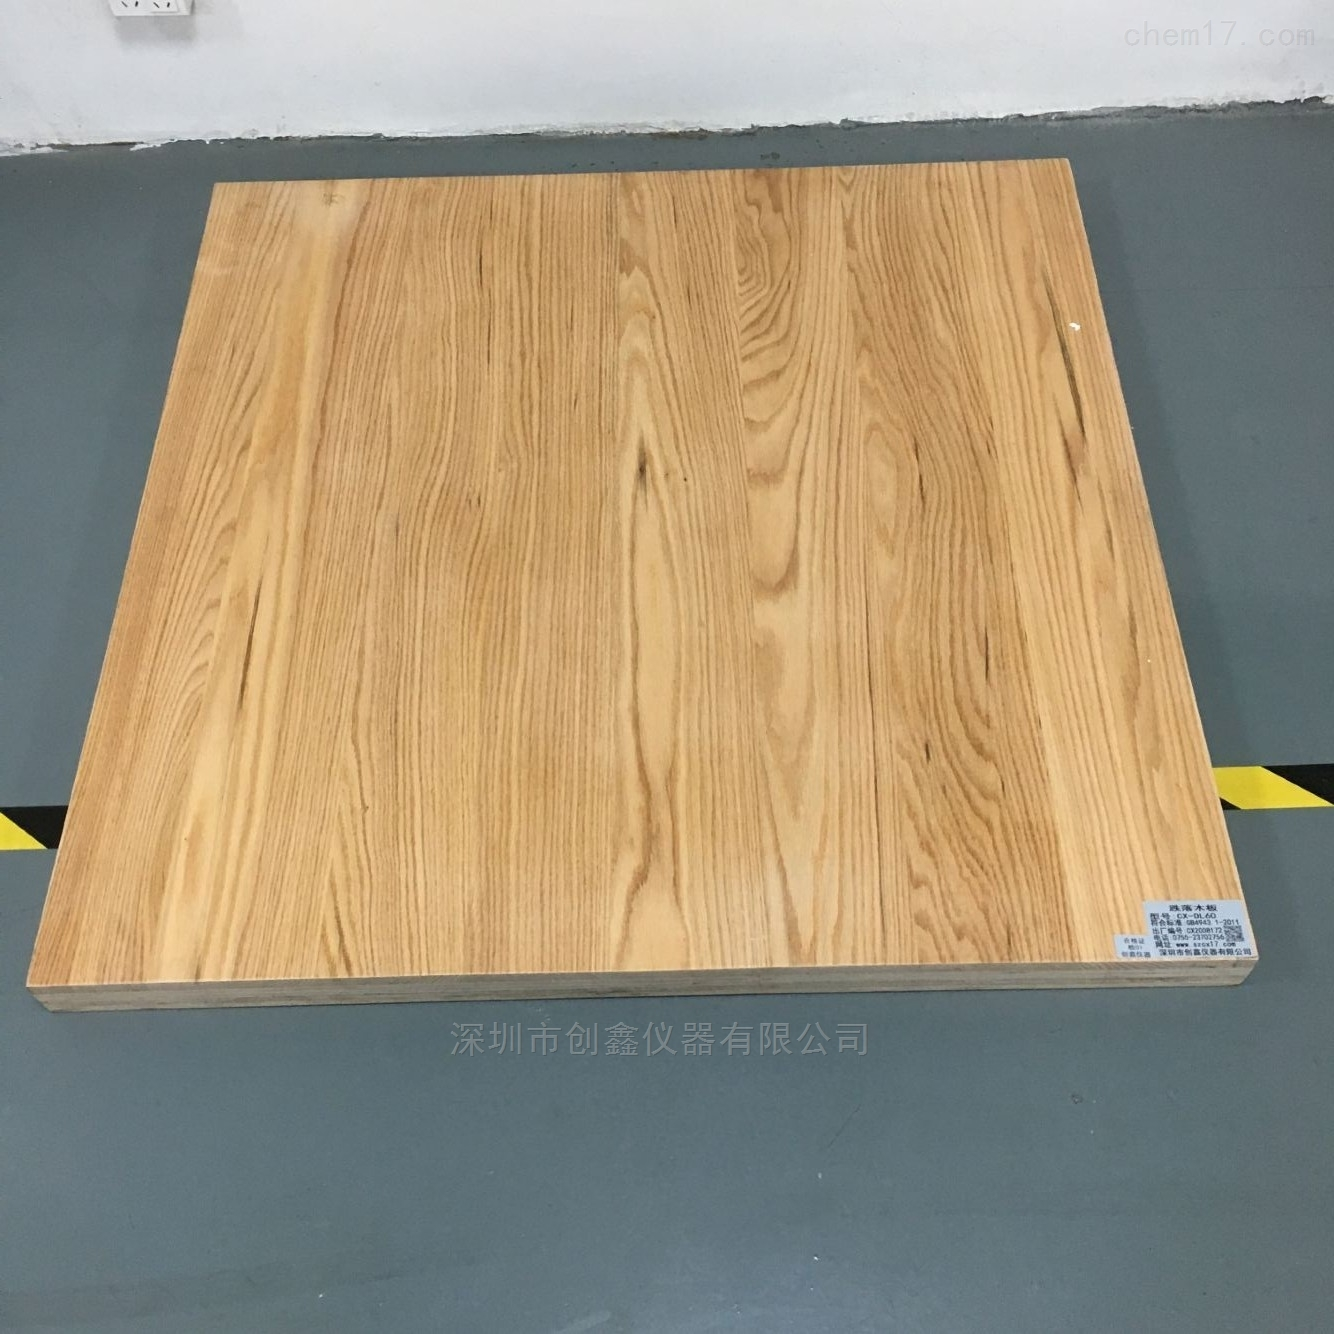 GB4943跌落測試木板